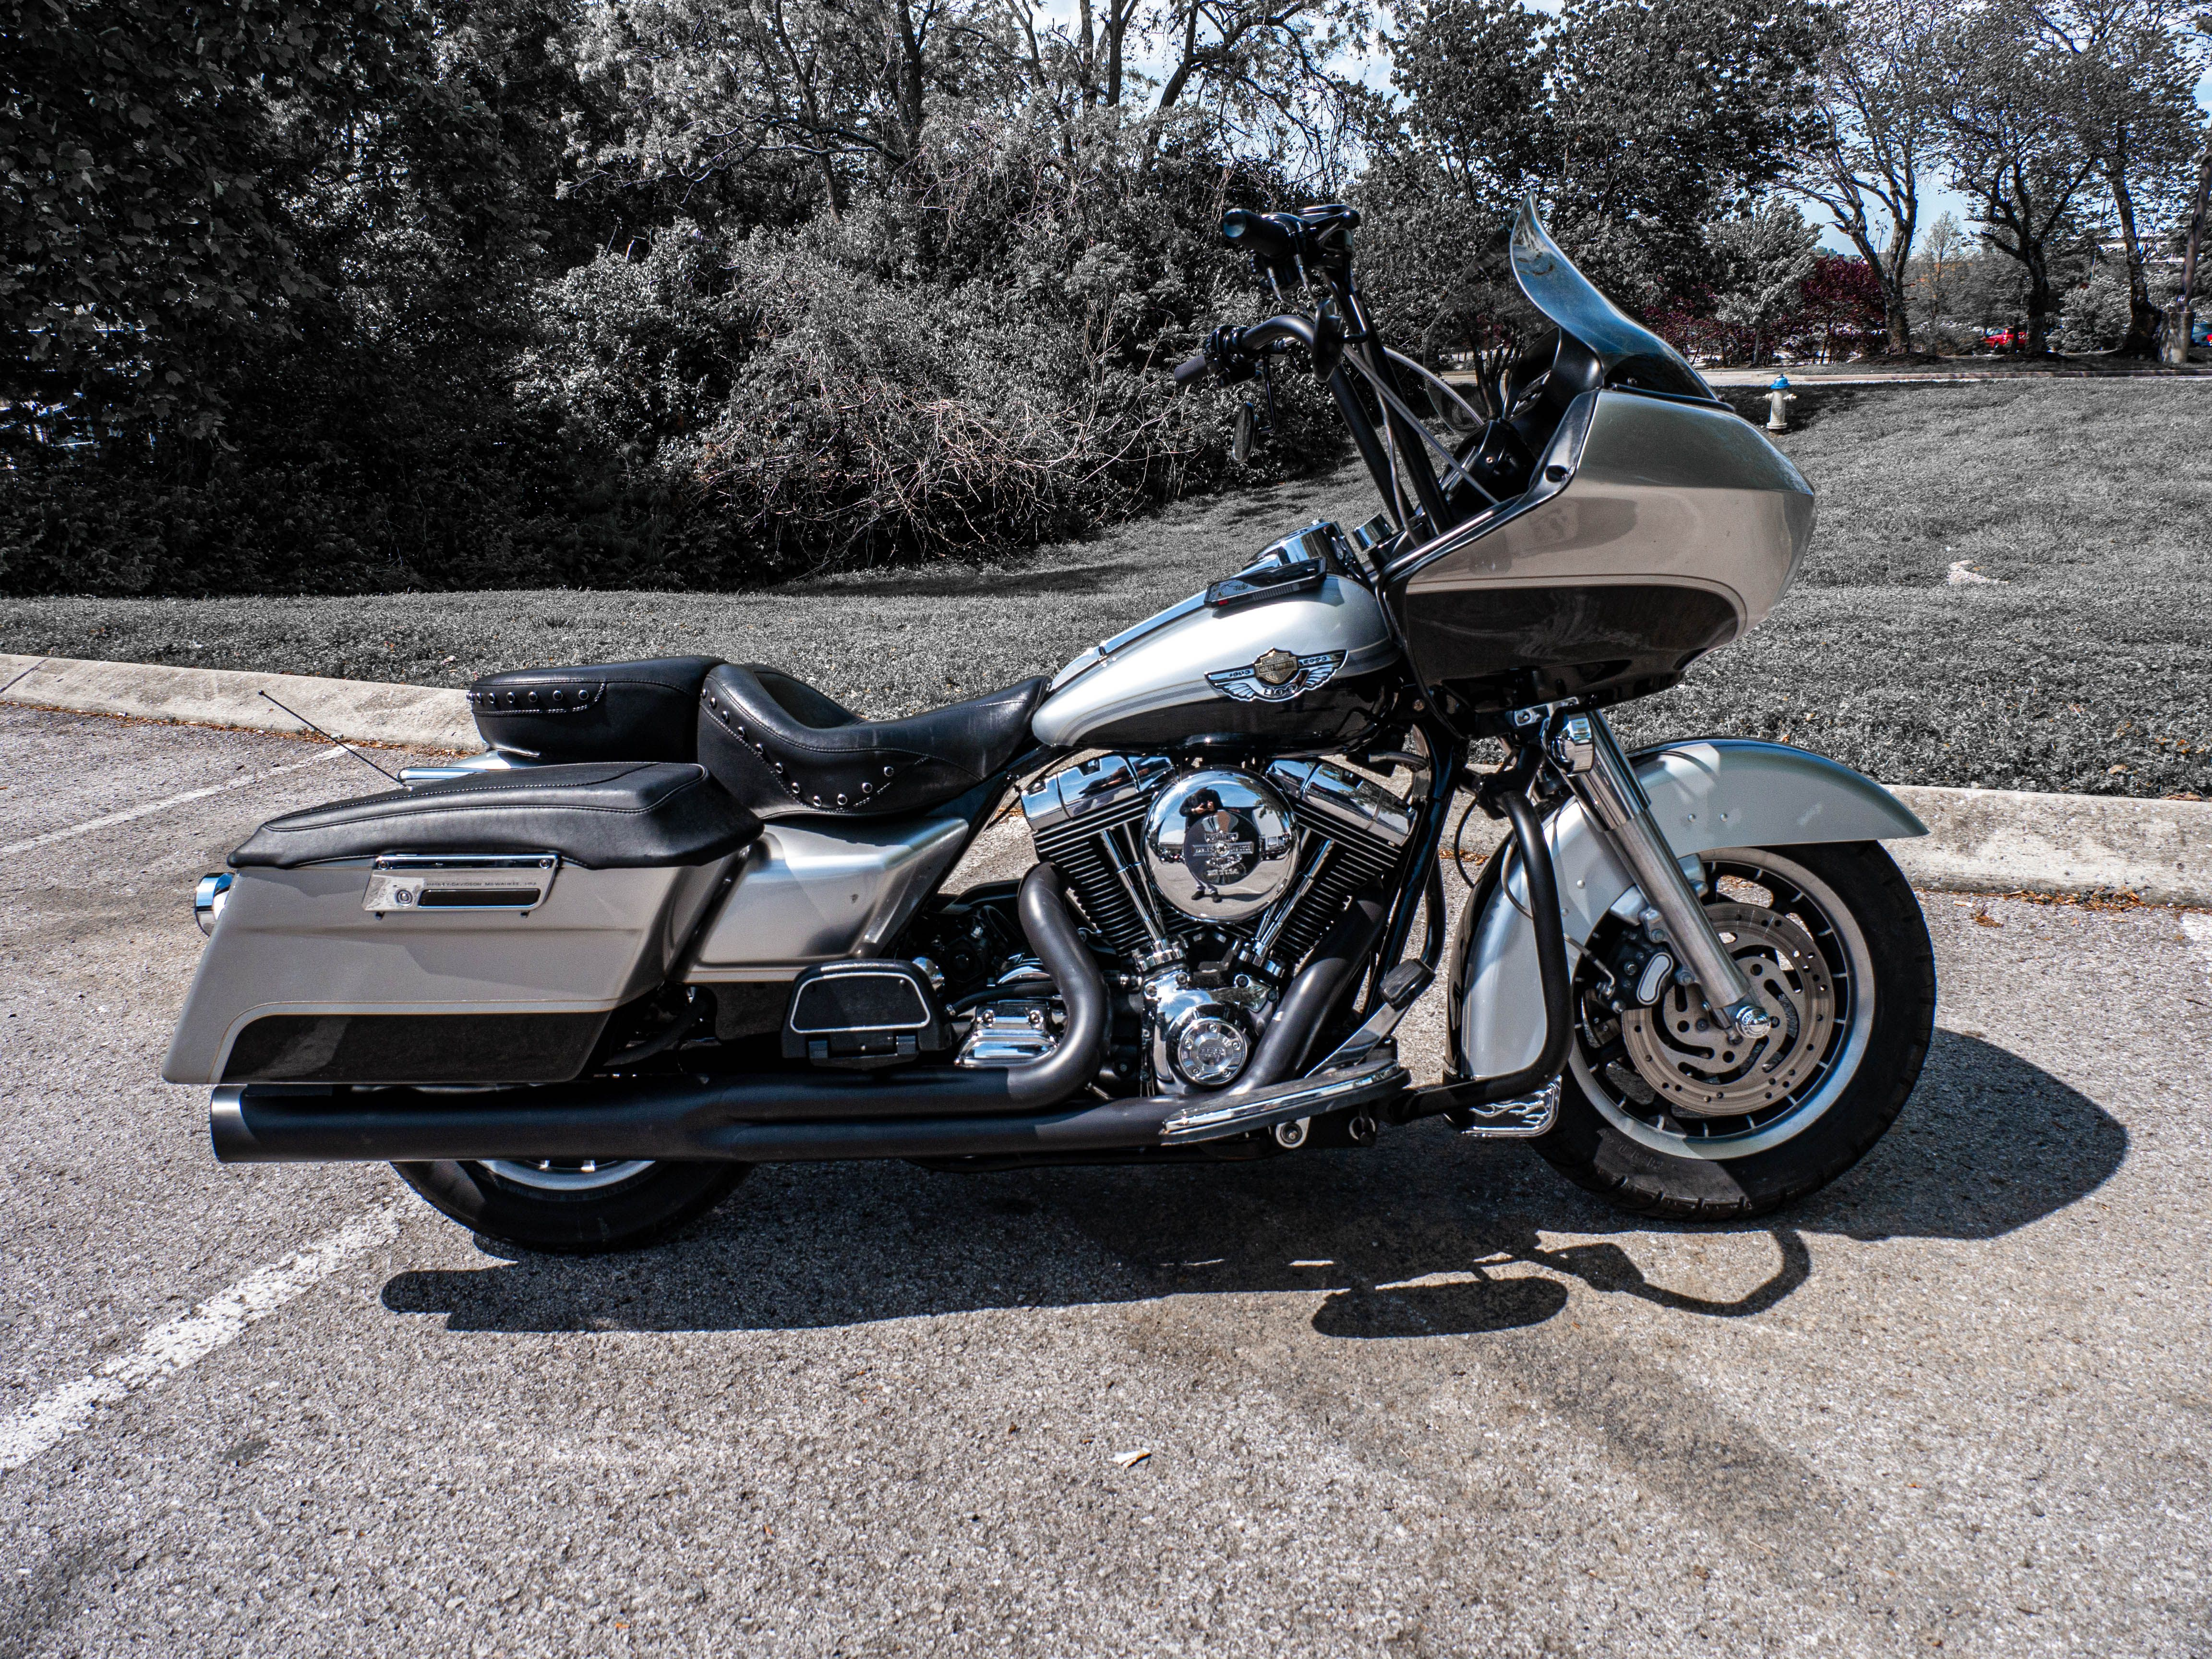 Pre-Owned 2003 Harley-Davidson FLTRX